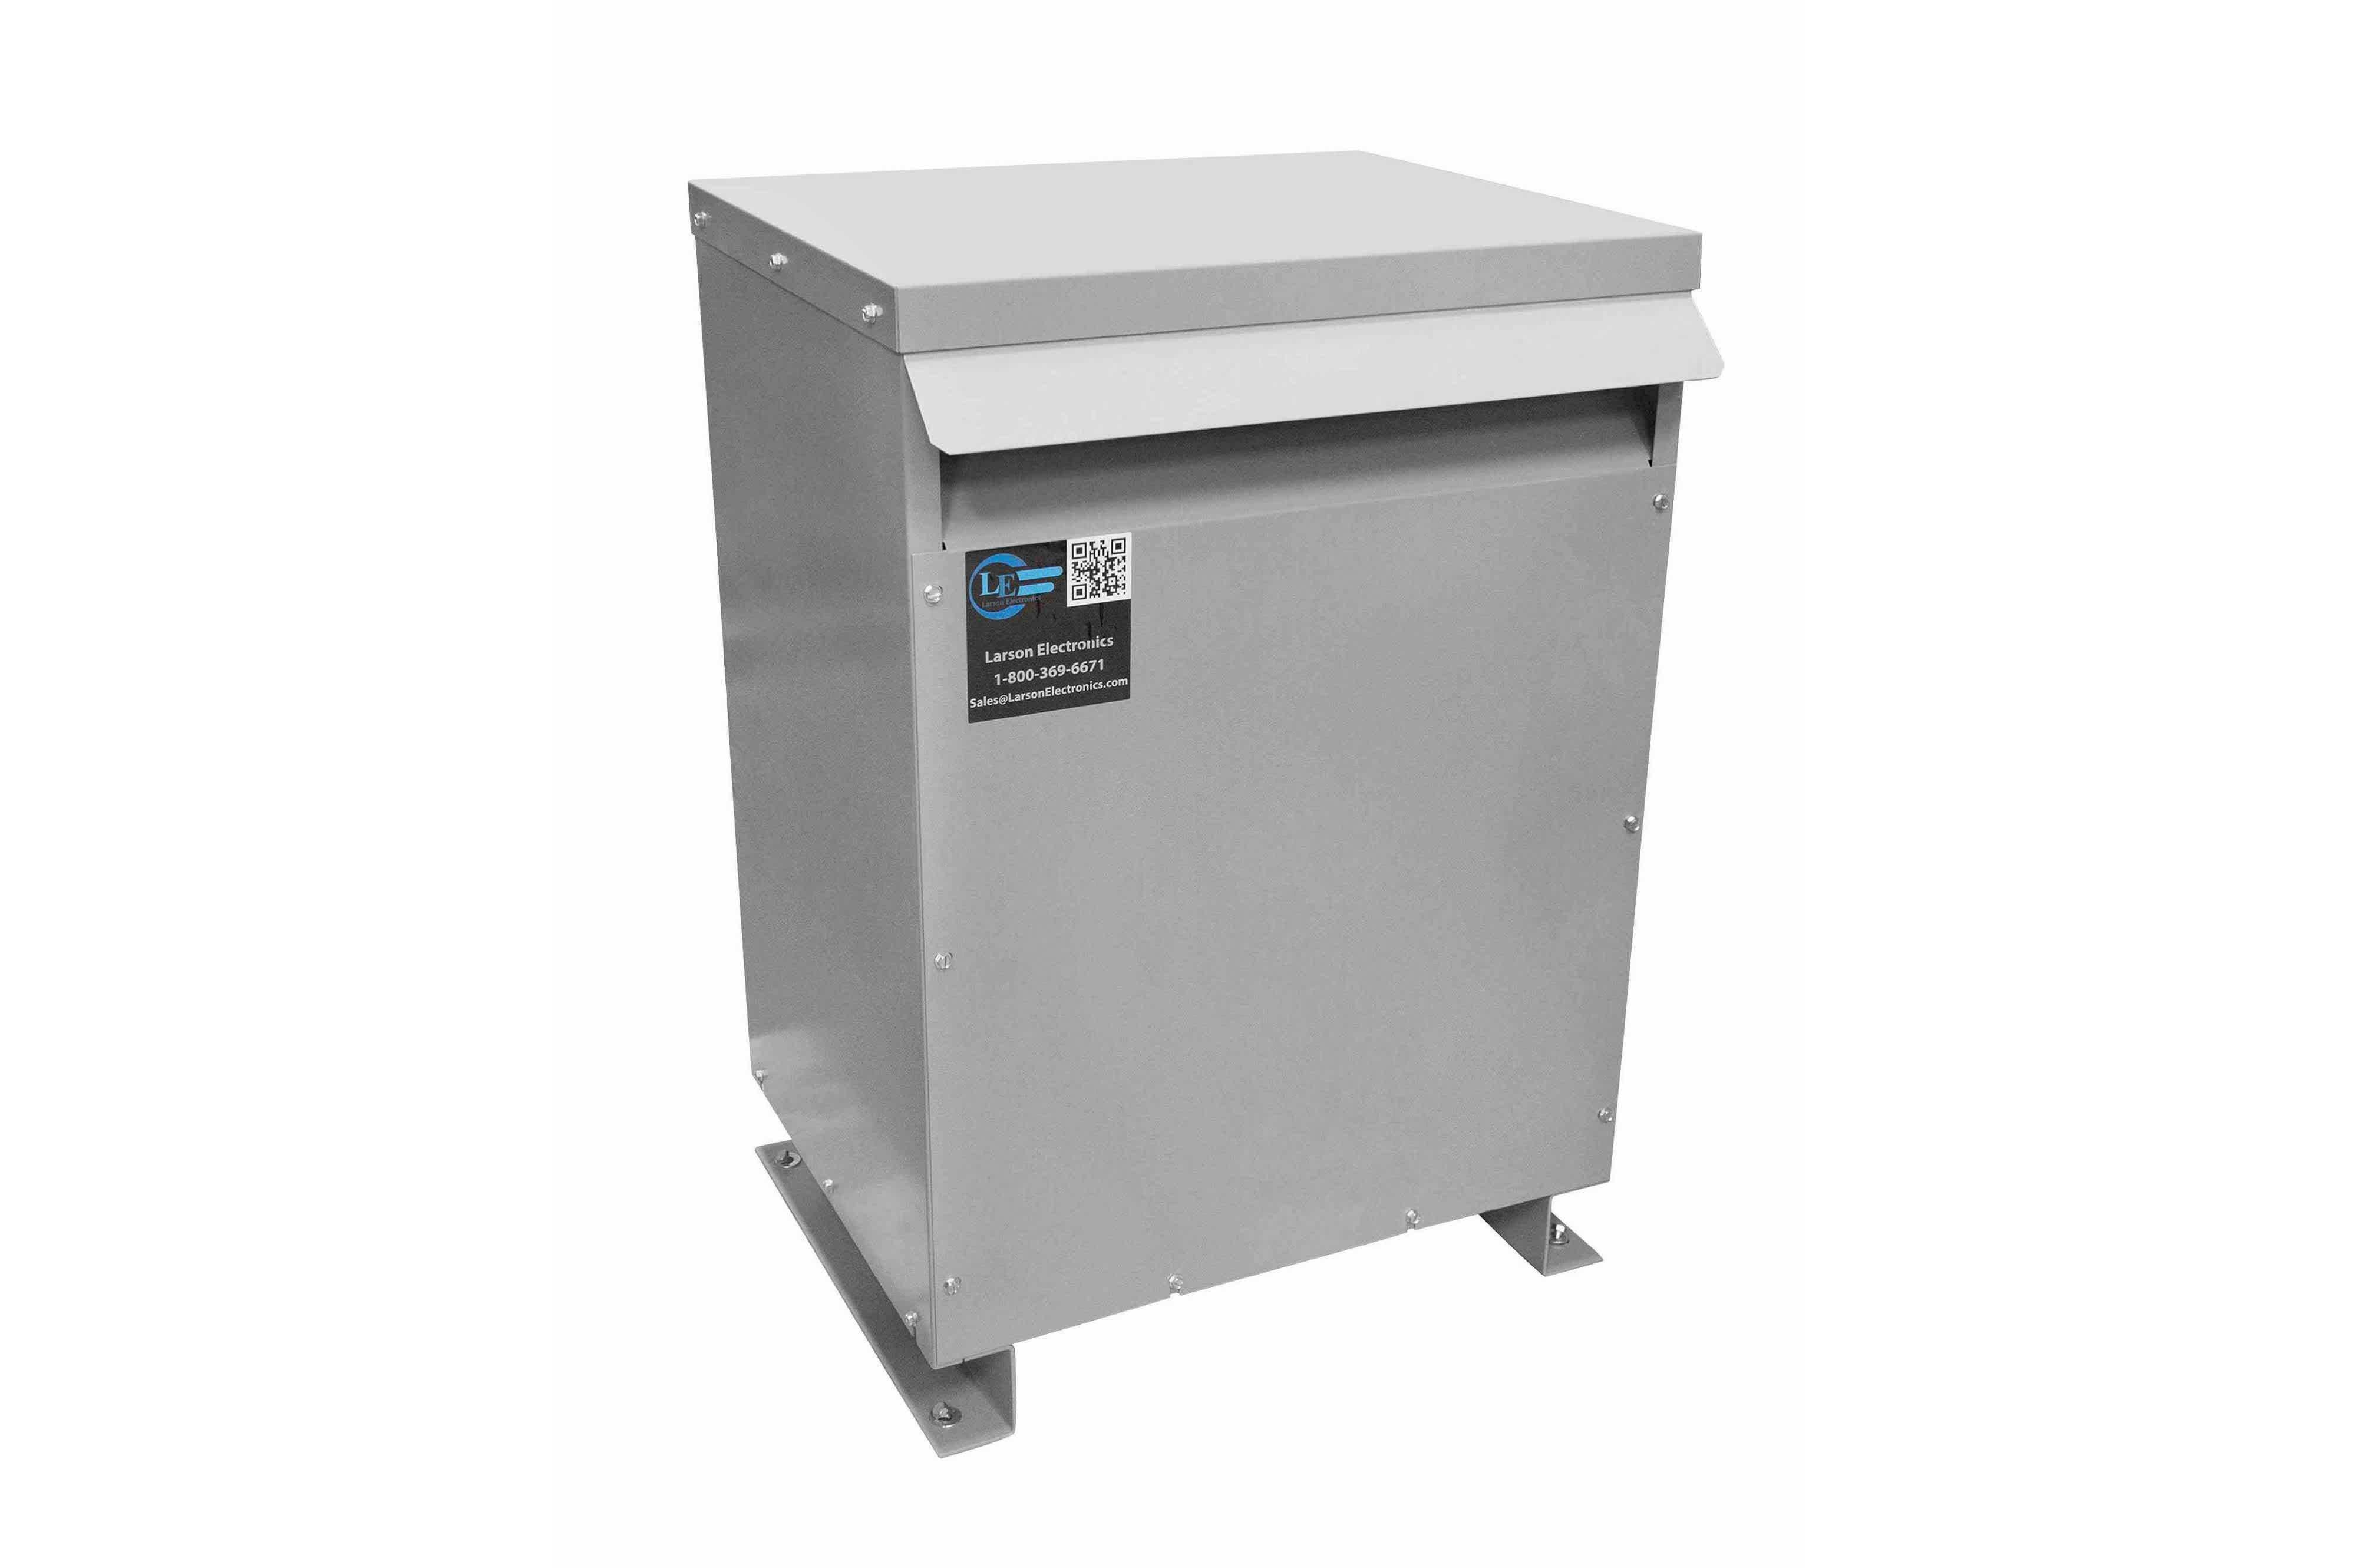 38 kVA 3PH Isolation Transformer, 575V Wye Primary, 415V Delta Secondary, N3R, Ventilated, 60 Hz